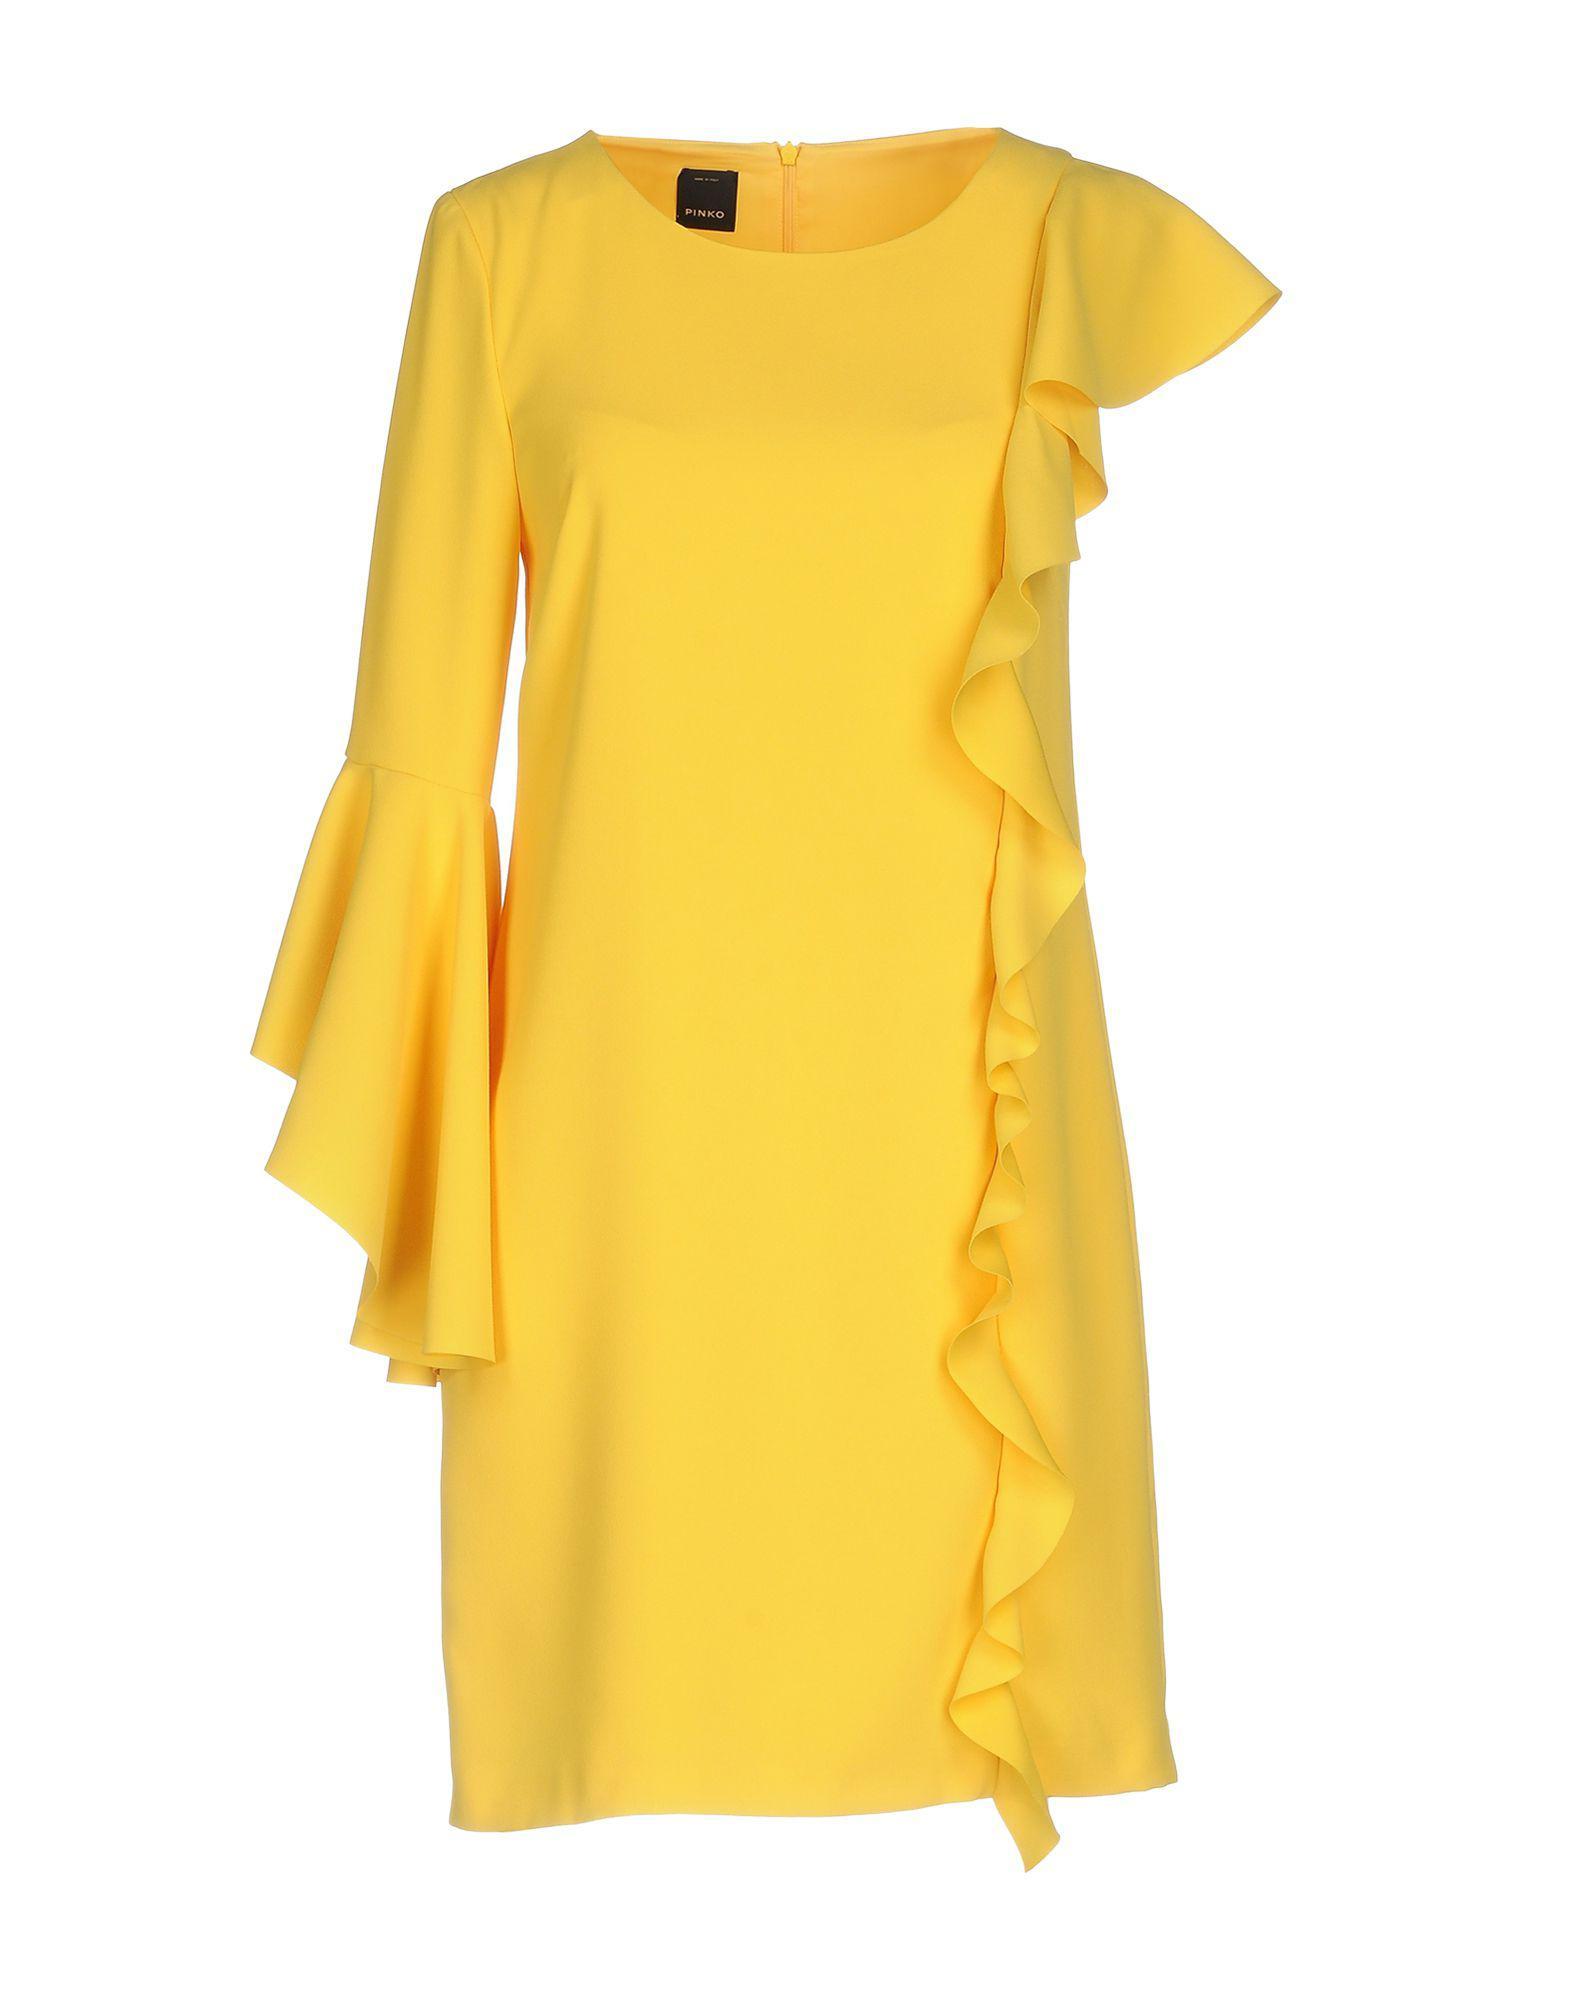 55f2068bfaa Pinko - Yellow Short Dress - Lyst. View fullscreen